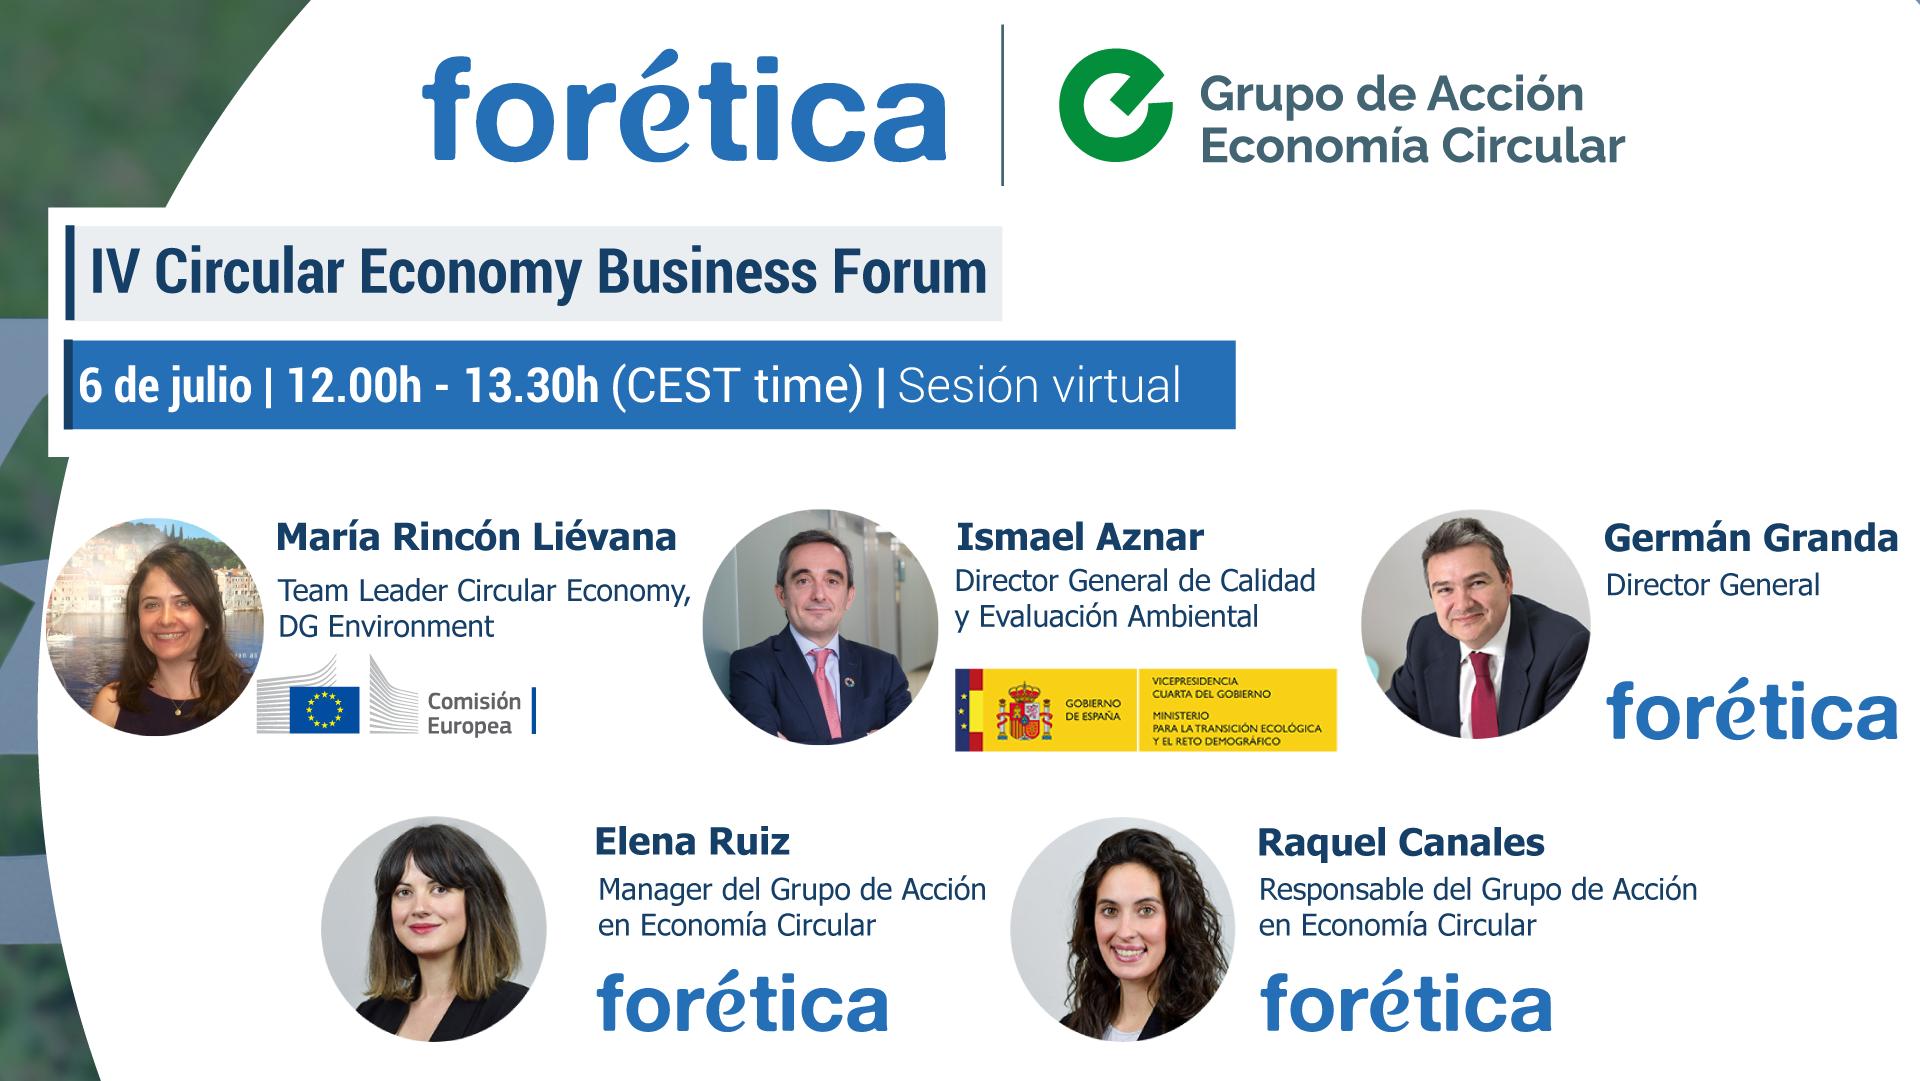 IV Circular Economy Business Forum